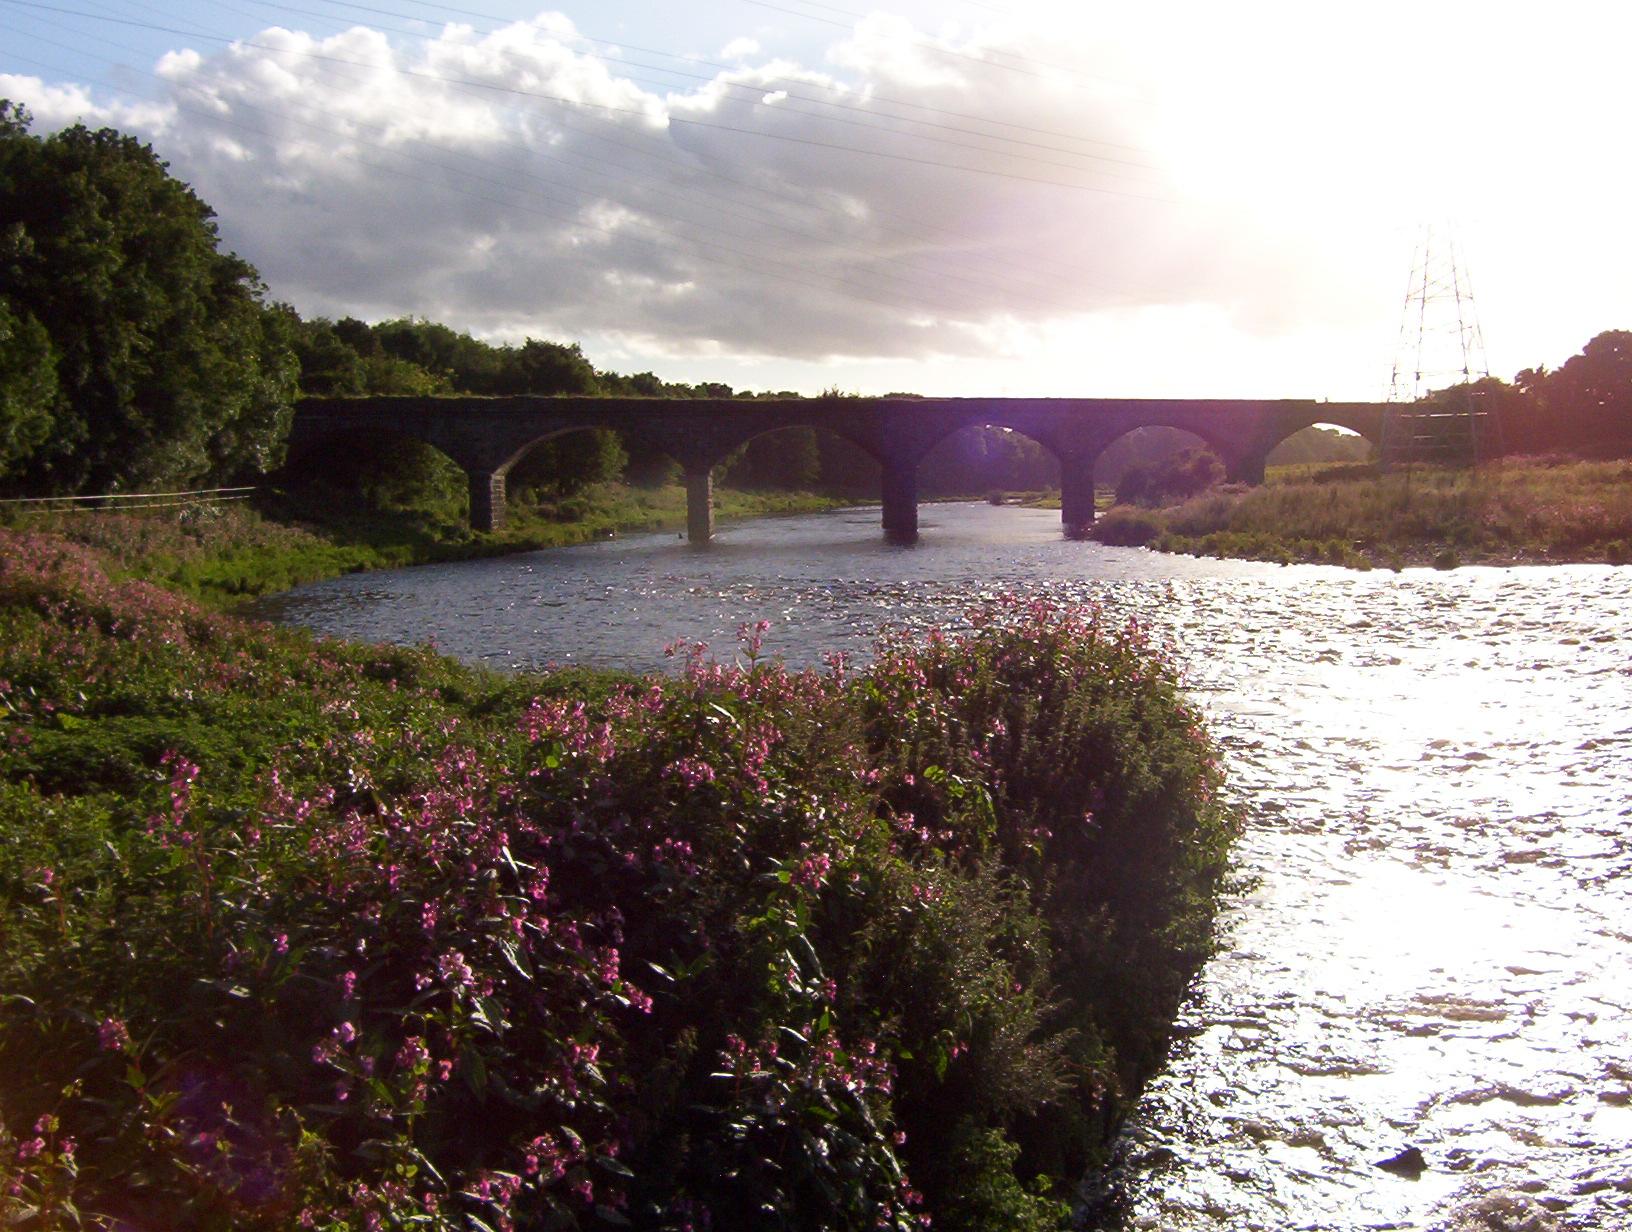 waverley-viaduct